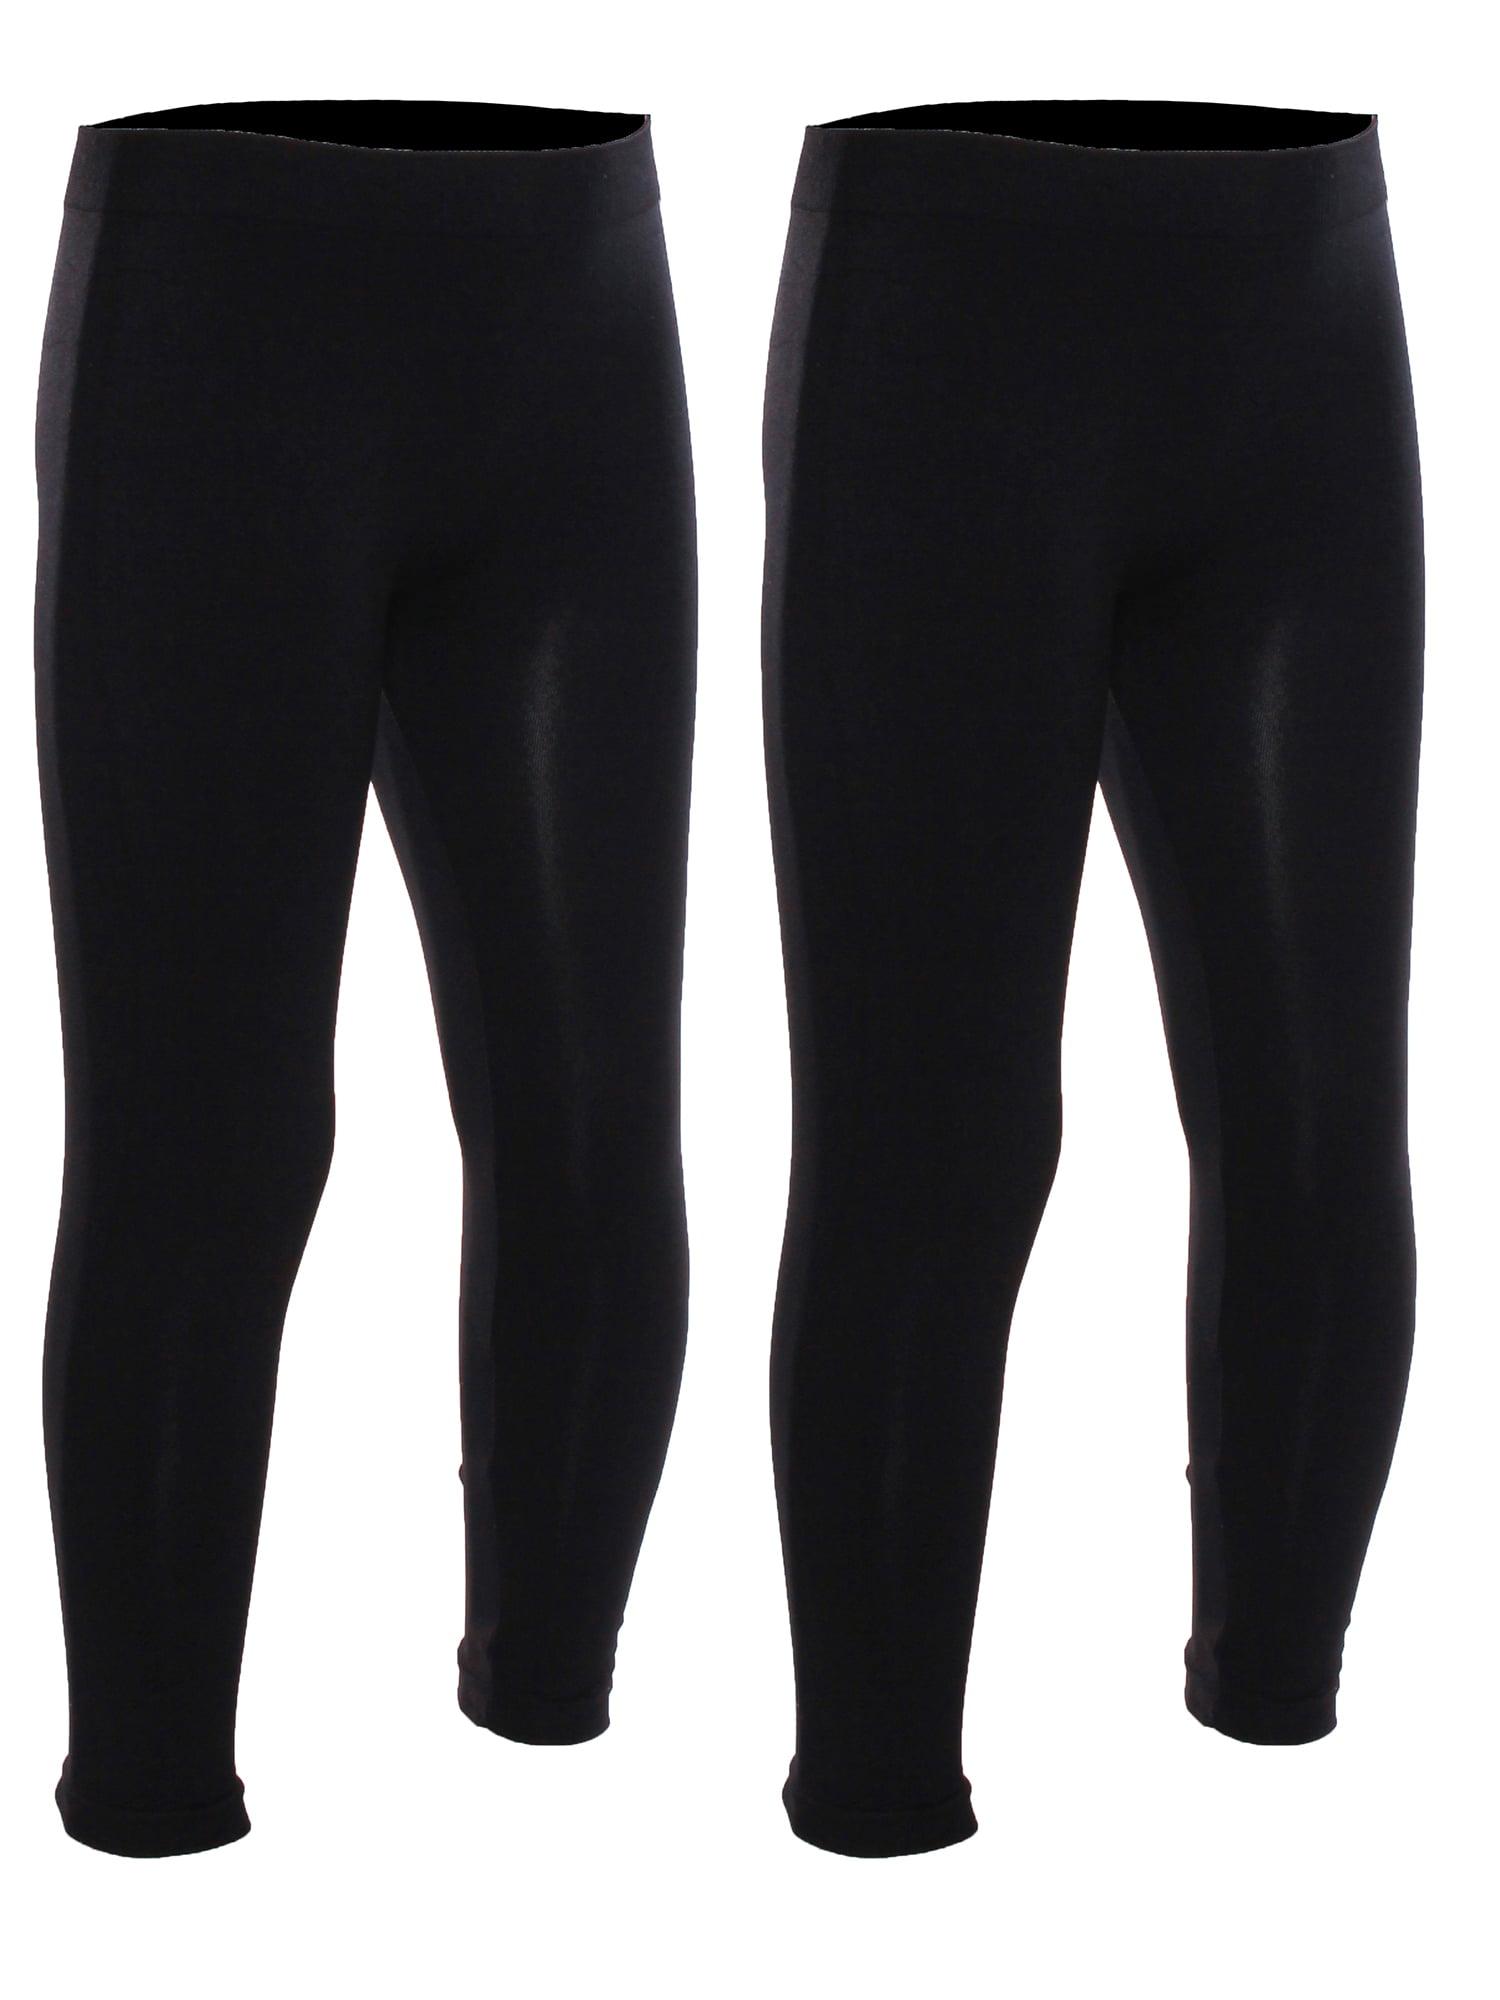 Emmalise Girls Seamless Ankle Length Legging Pants 5-12 years old Regular or Fleece